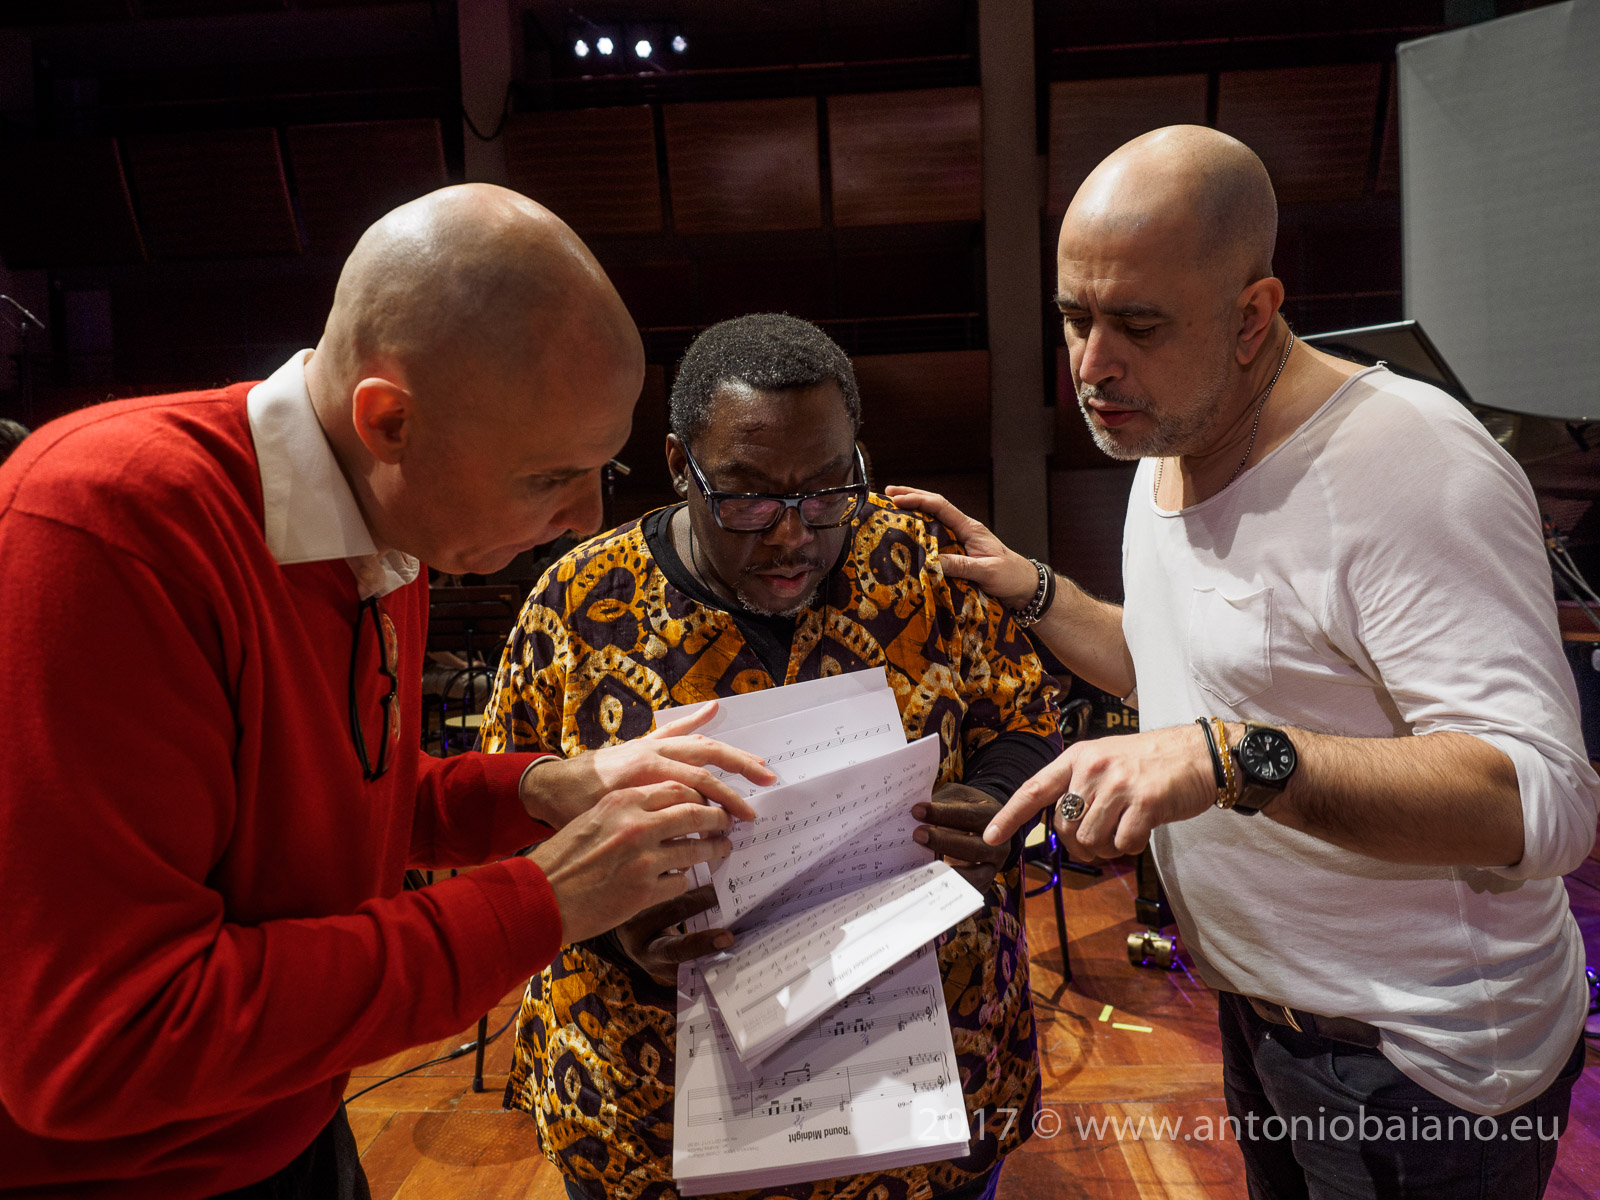 Andrea Ravizza with Cyrus Chestnut and Flavio Boltro during art auction - Dizzy Gillespie Centenary - Moncalieri Jazz Festival